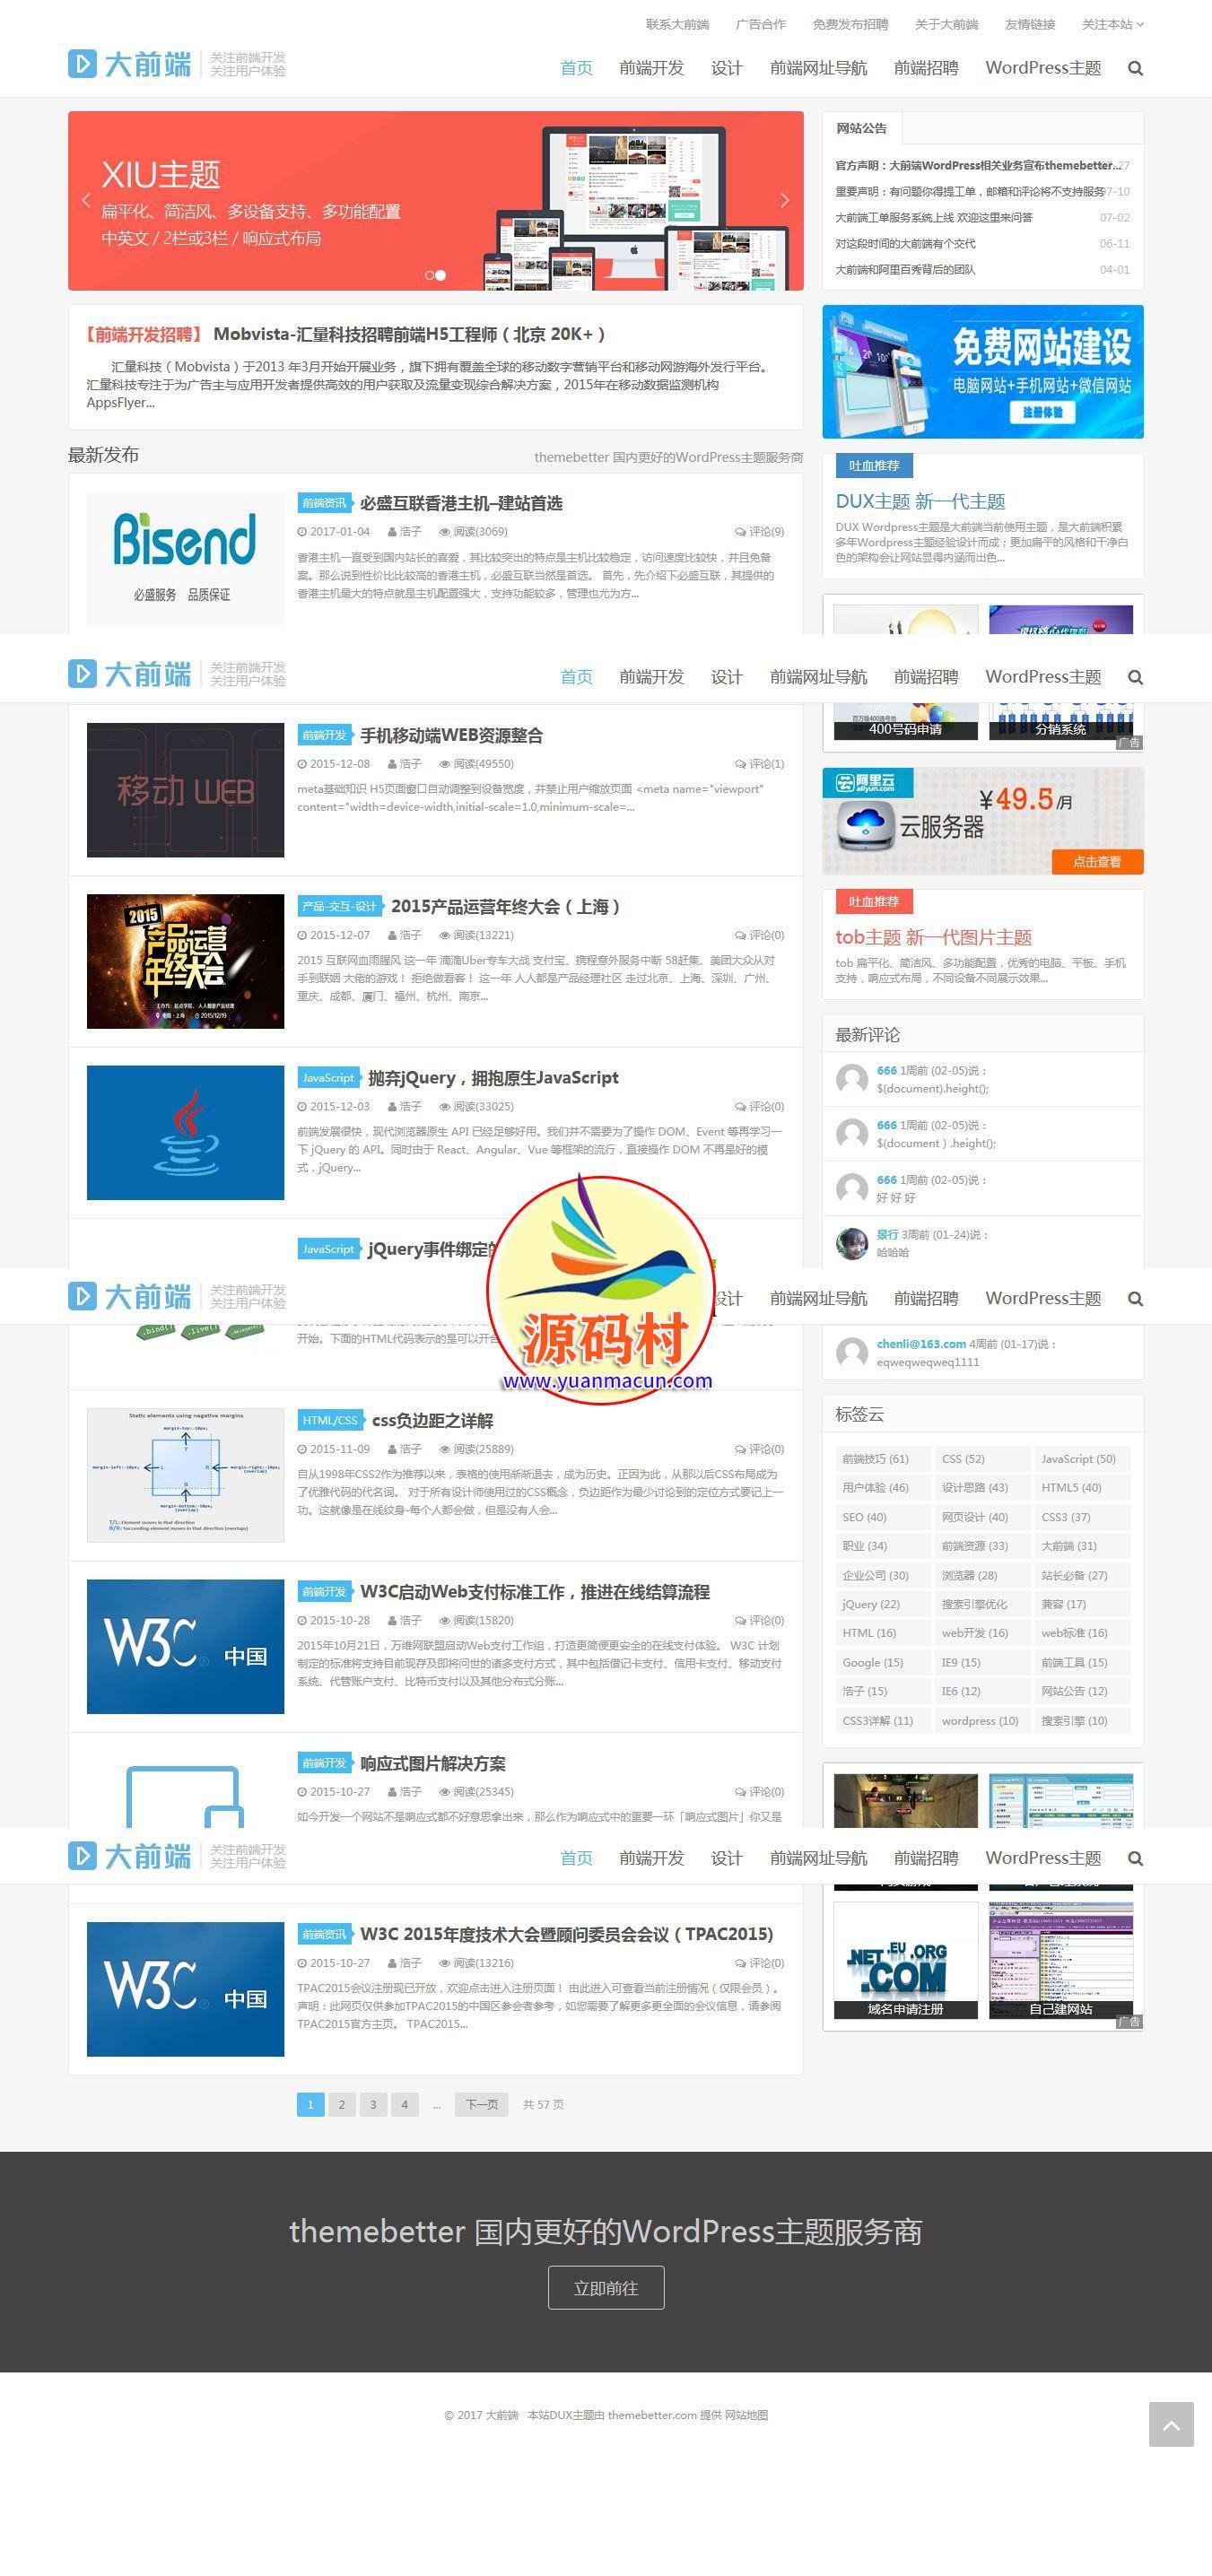 WordPress DUX主题1.8最新版下载 wp dux主题更新至1.8 新增自定义外链图片缩略图等